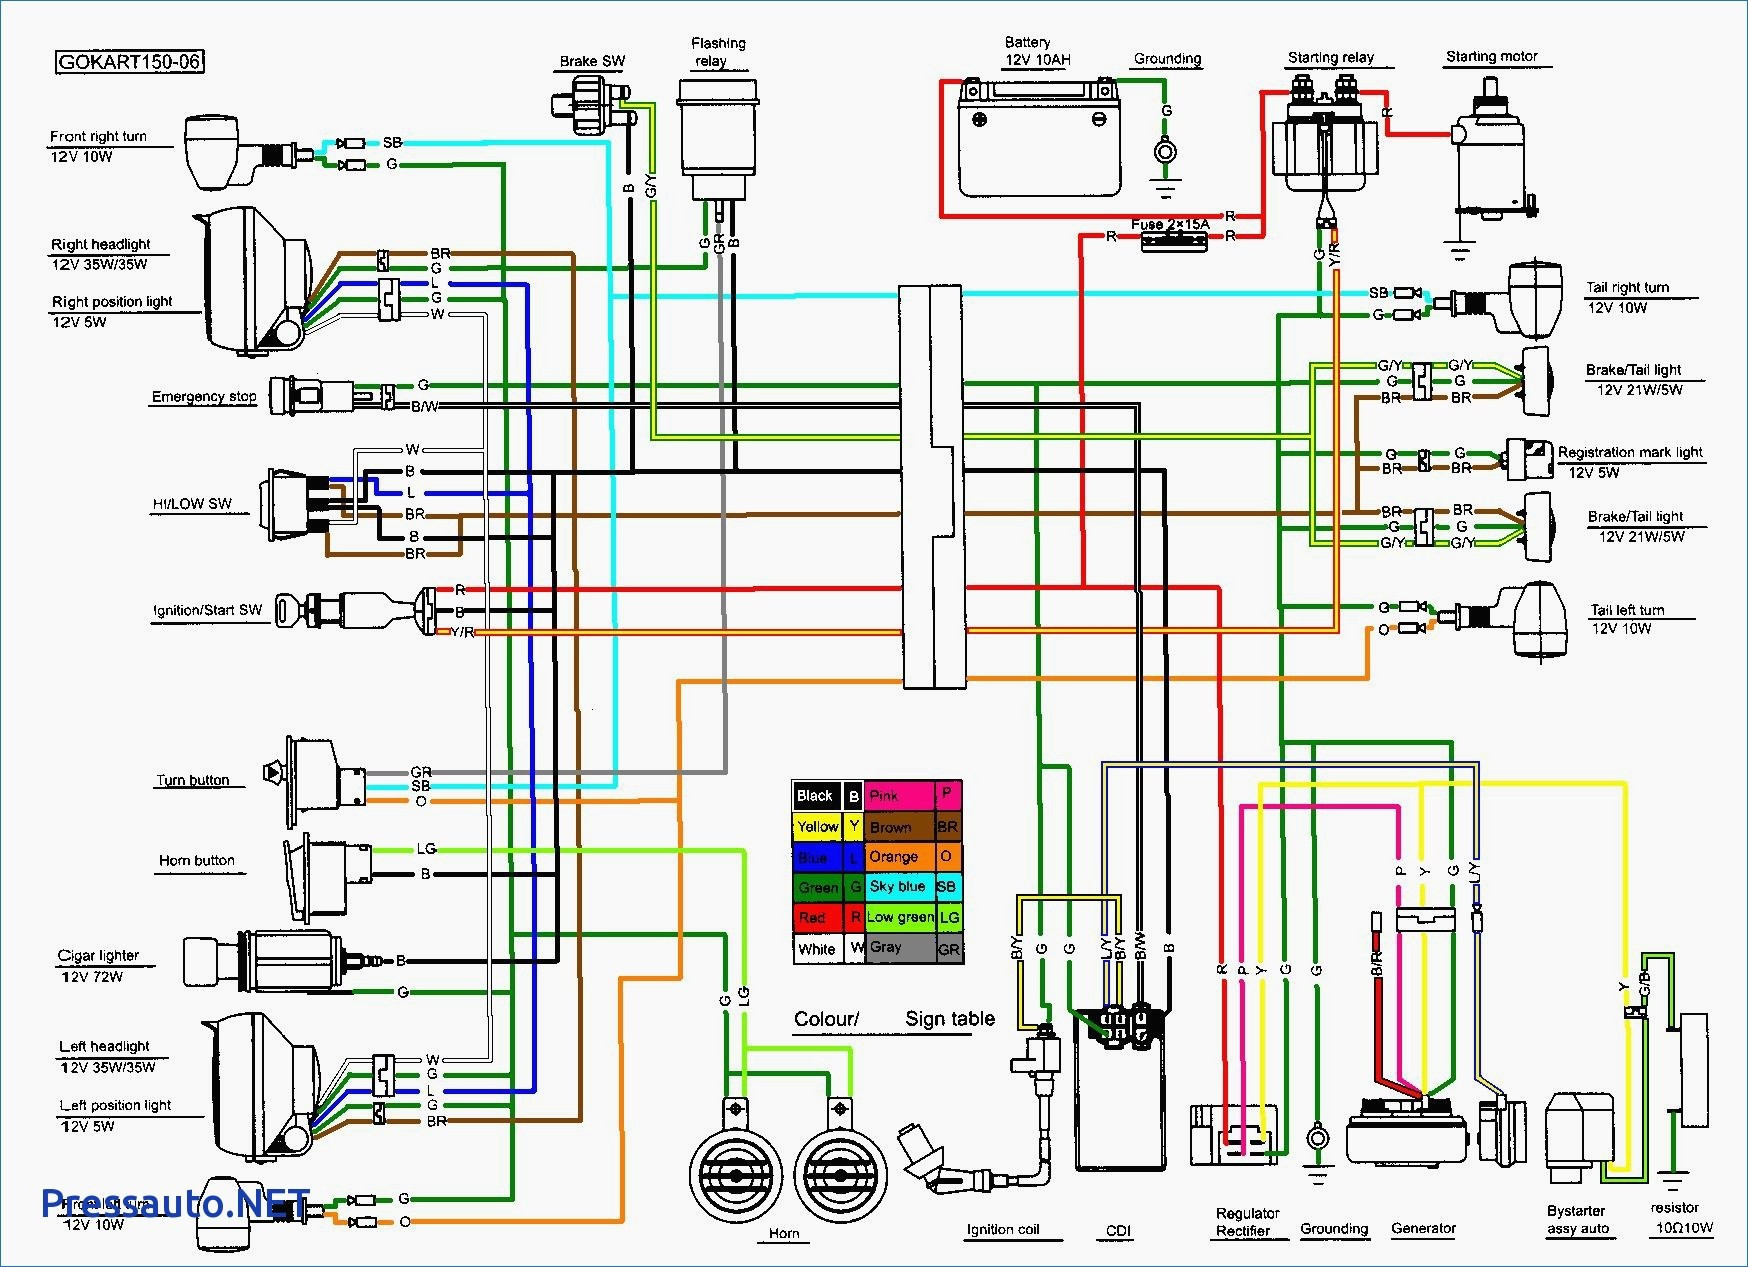 Taotao Wiring Harness Diagram - Schema Wiring Diagram - Chinese Atv Wiring Diagram